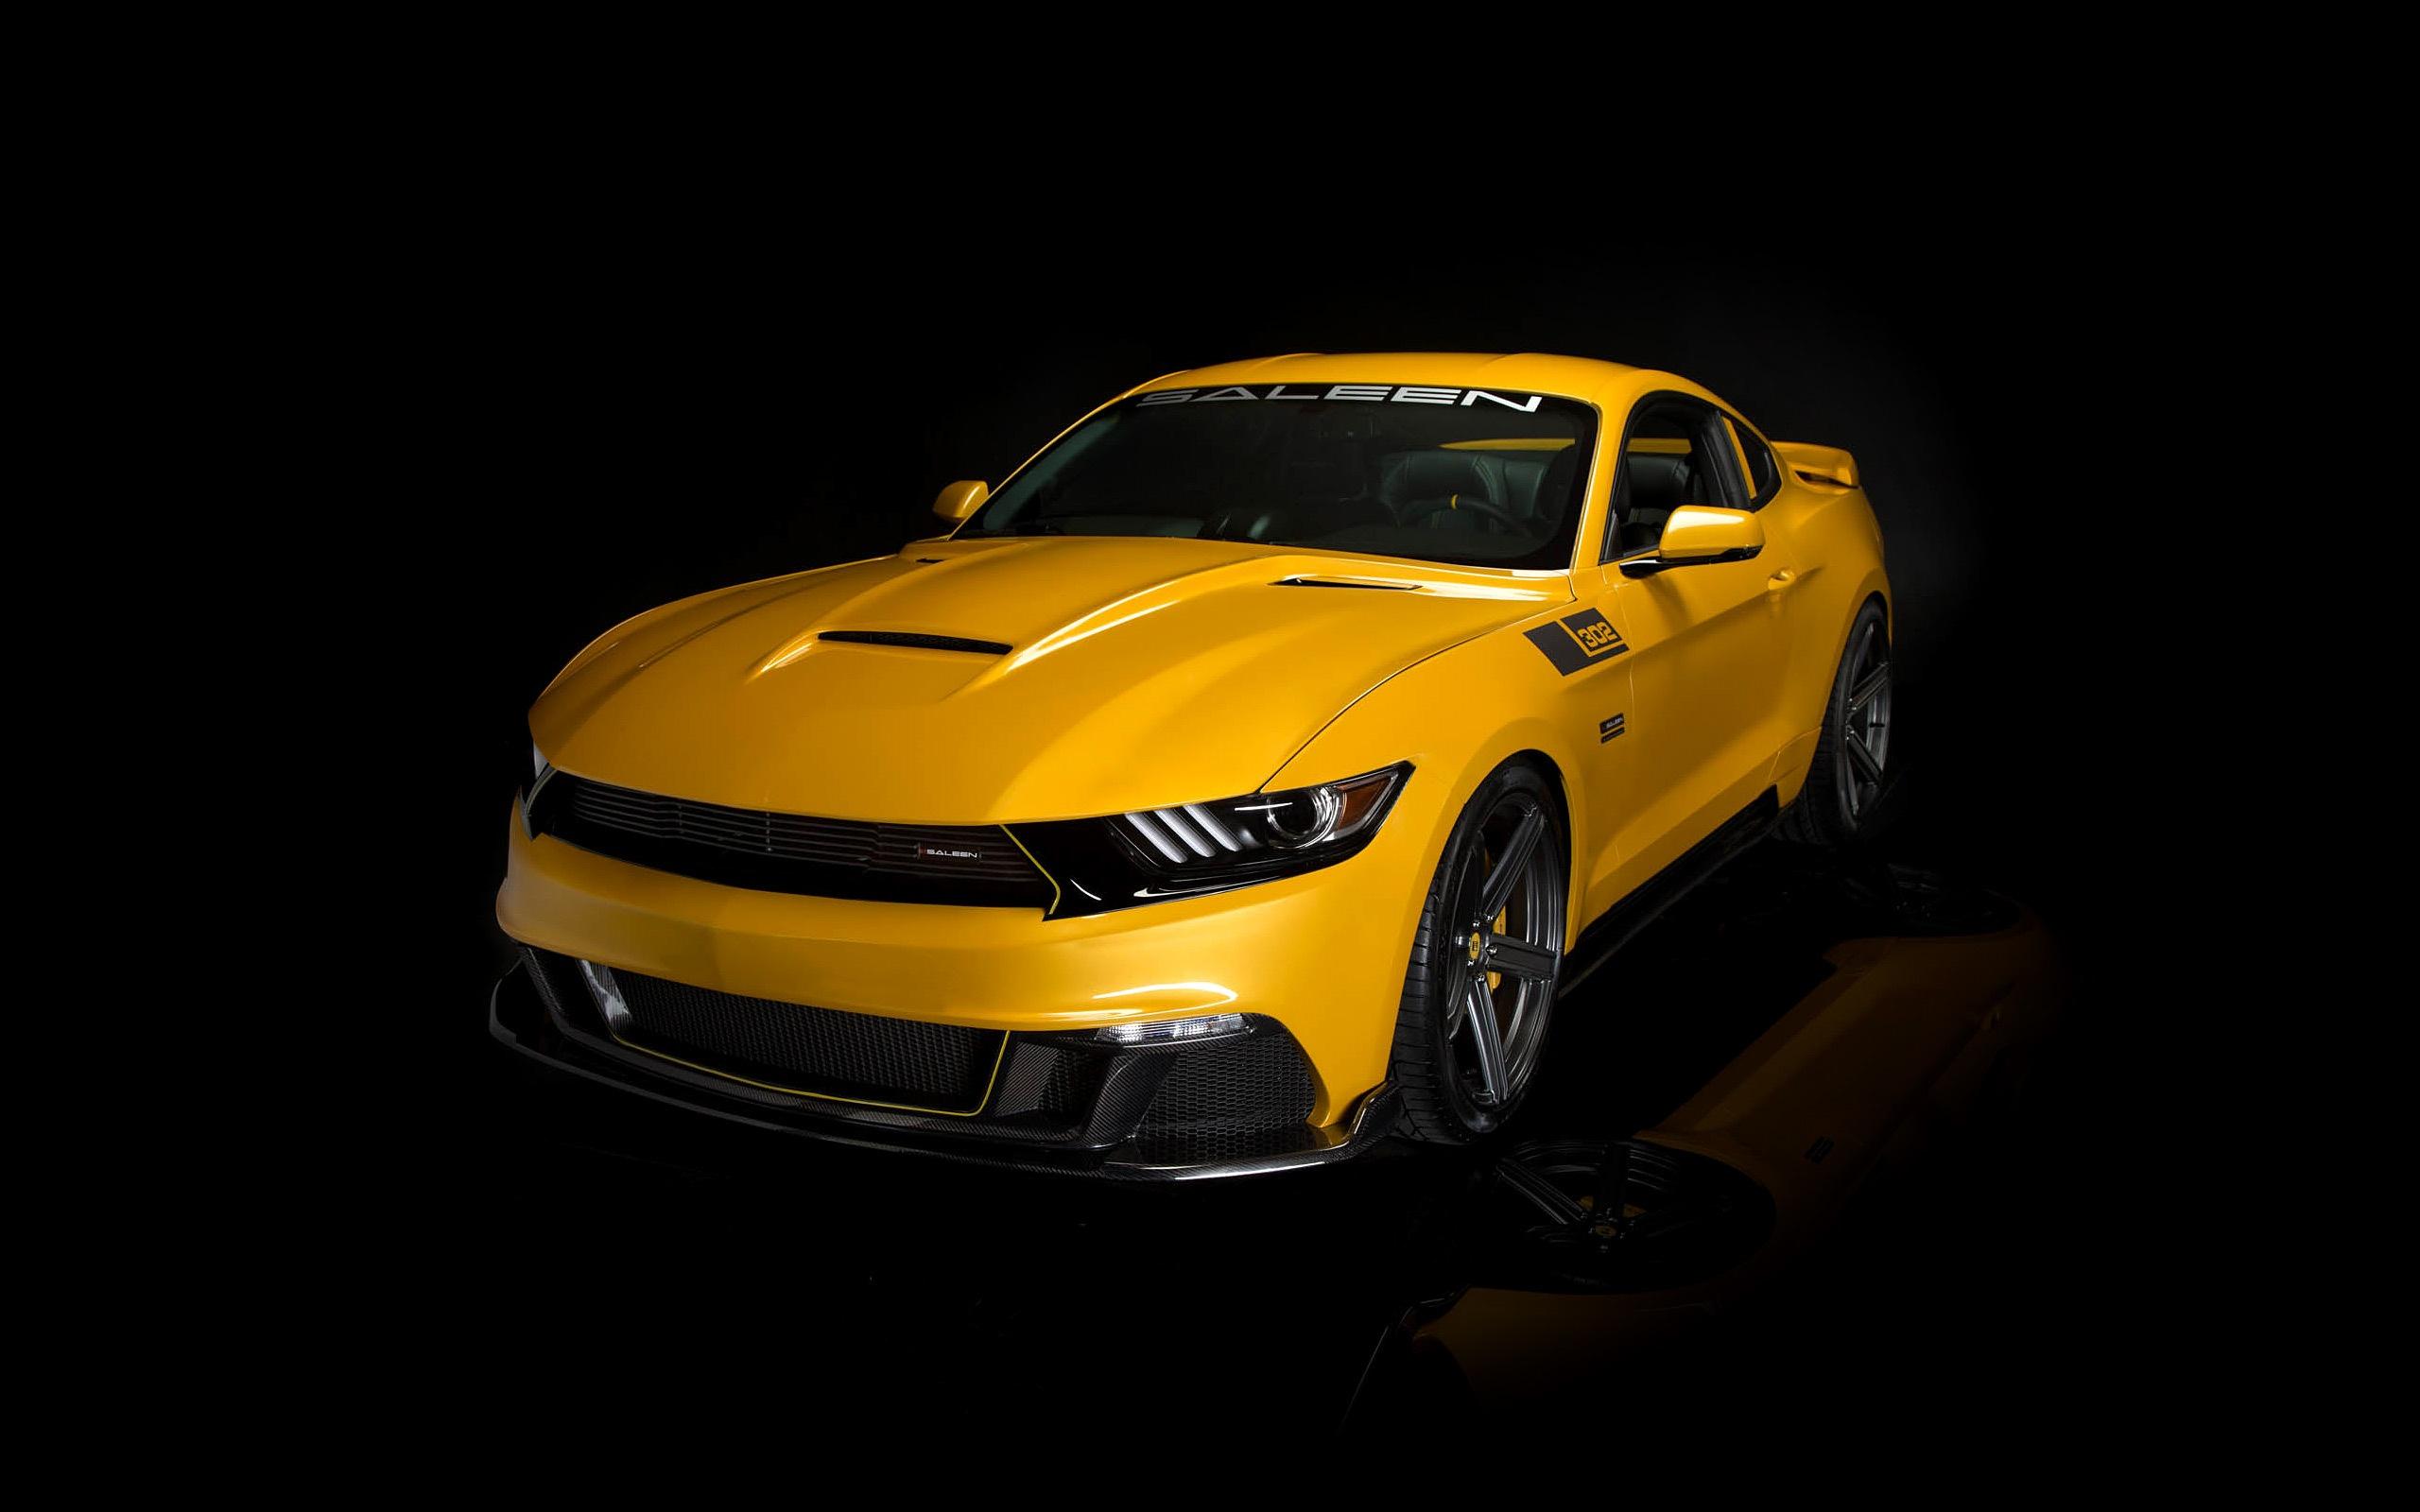 2015 Saleen Mustang S302 Black Label Wallpaper HD Car Wallpapers 2560x1600